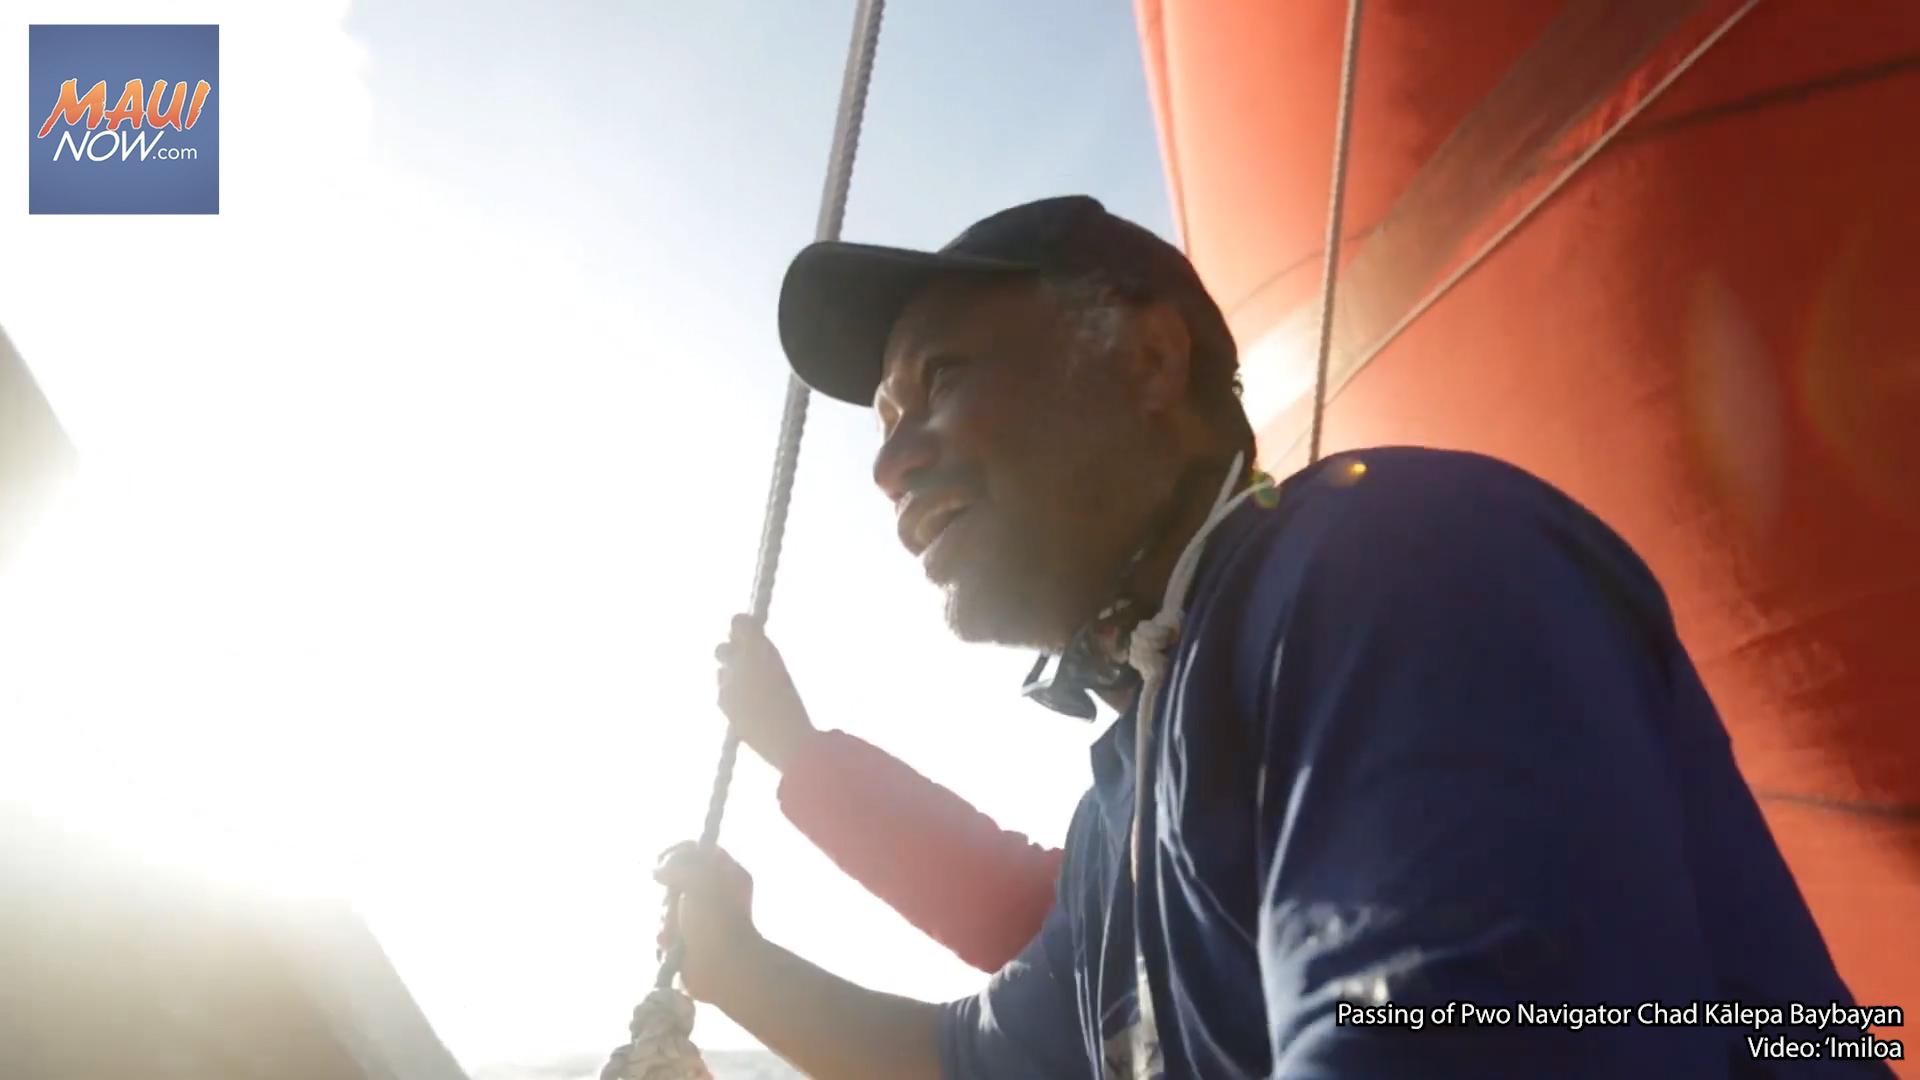 Remembering Hōkūleʻa Crew Member and Pwo Navigator Chad Kālepa Baybayan